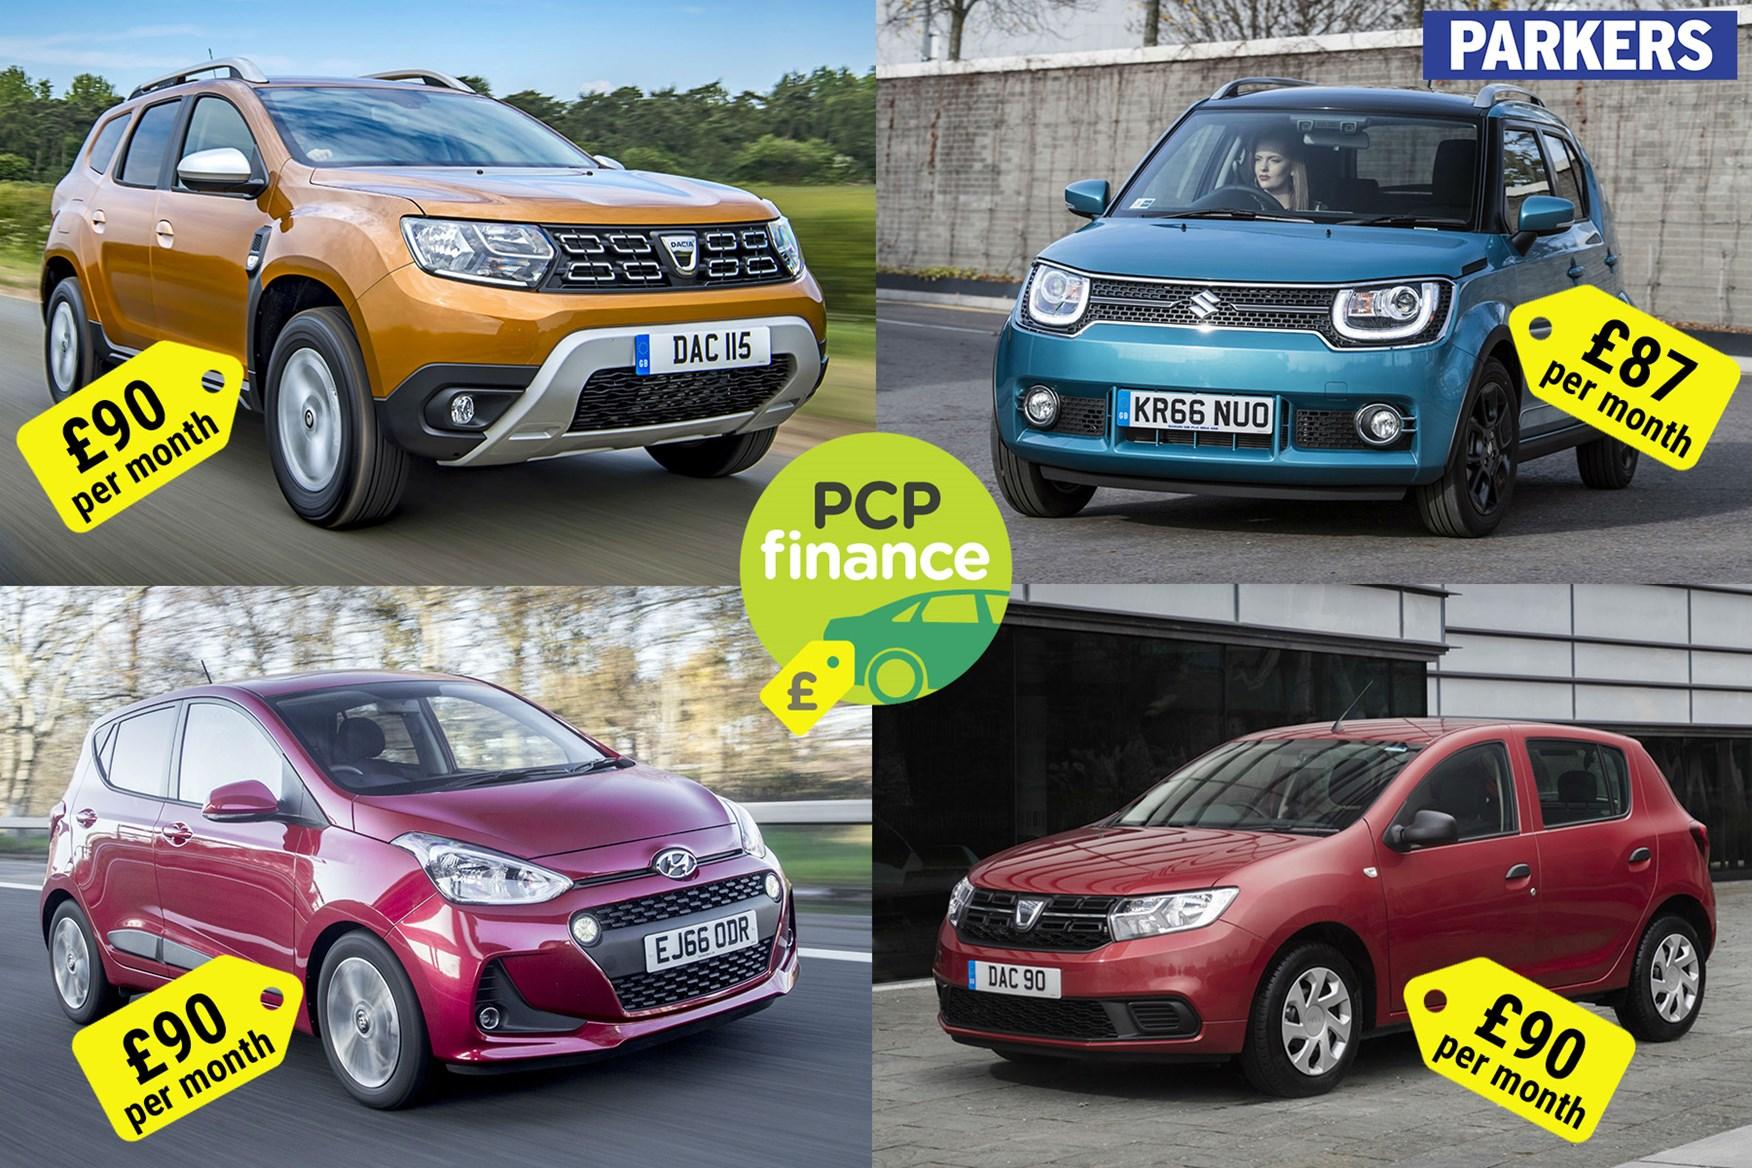 car pcp deals glasgow